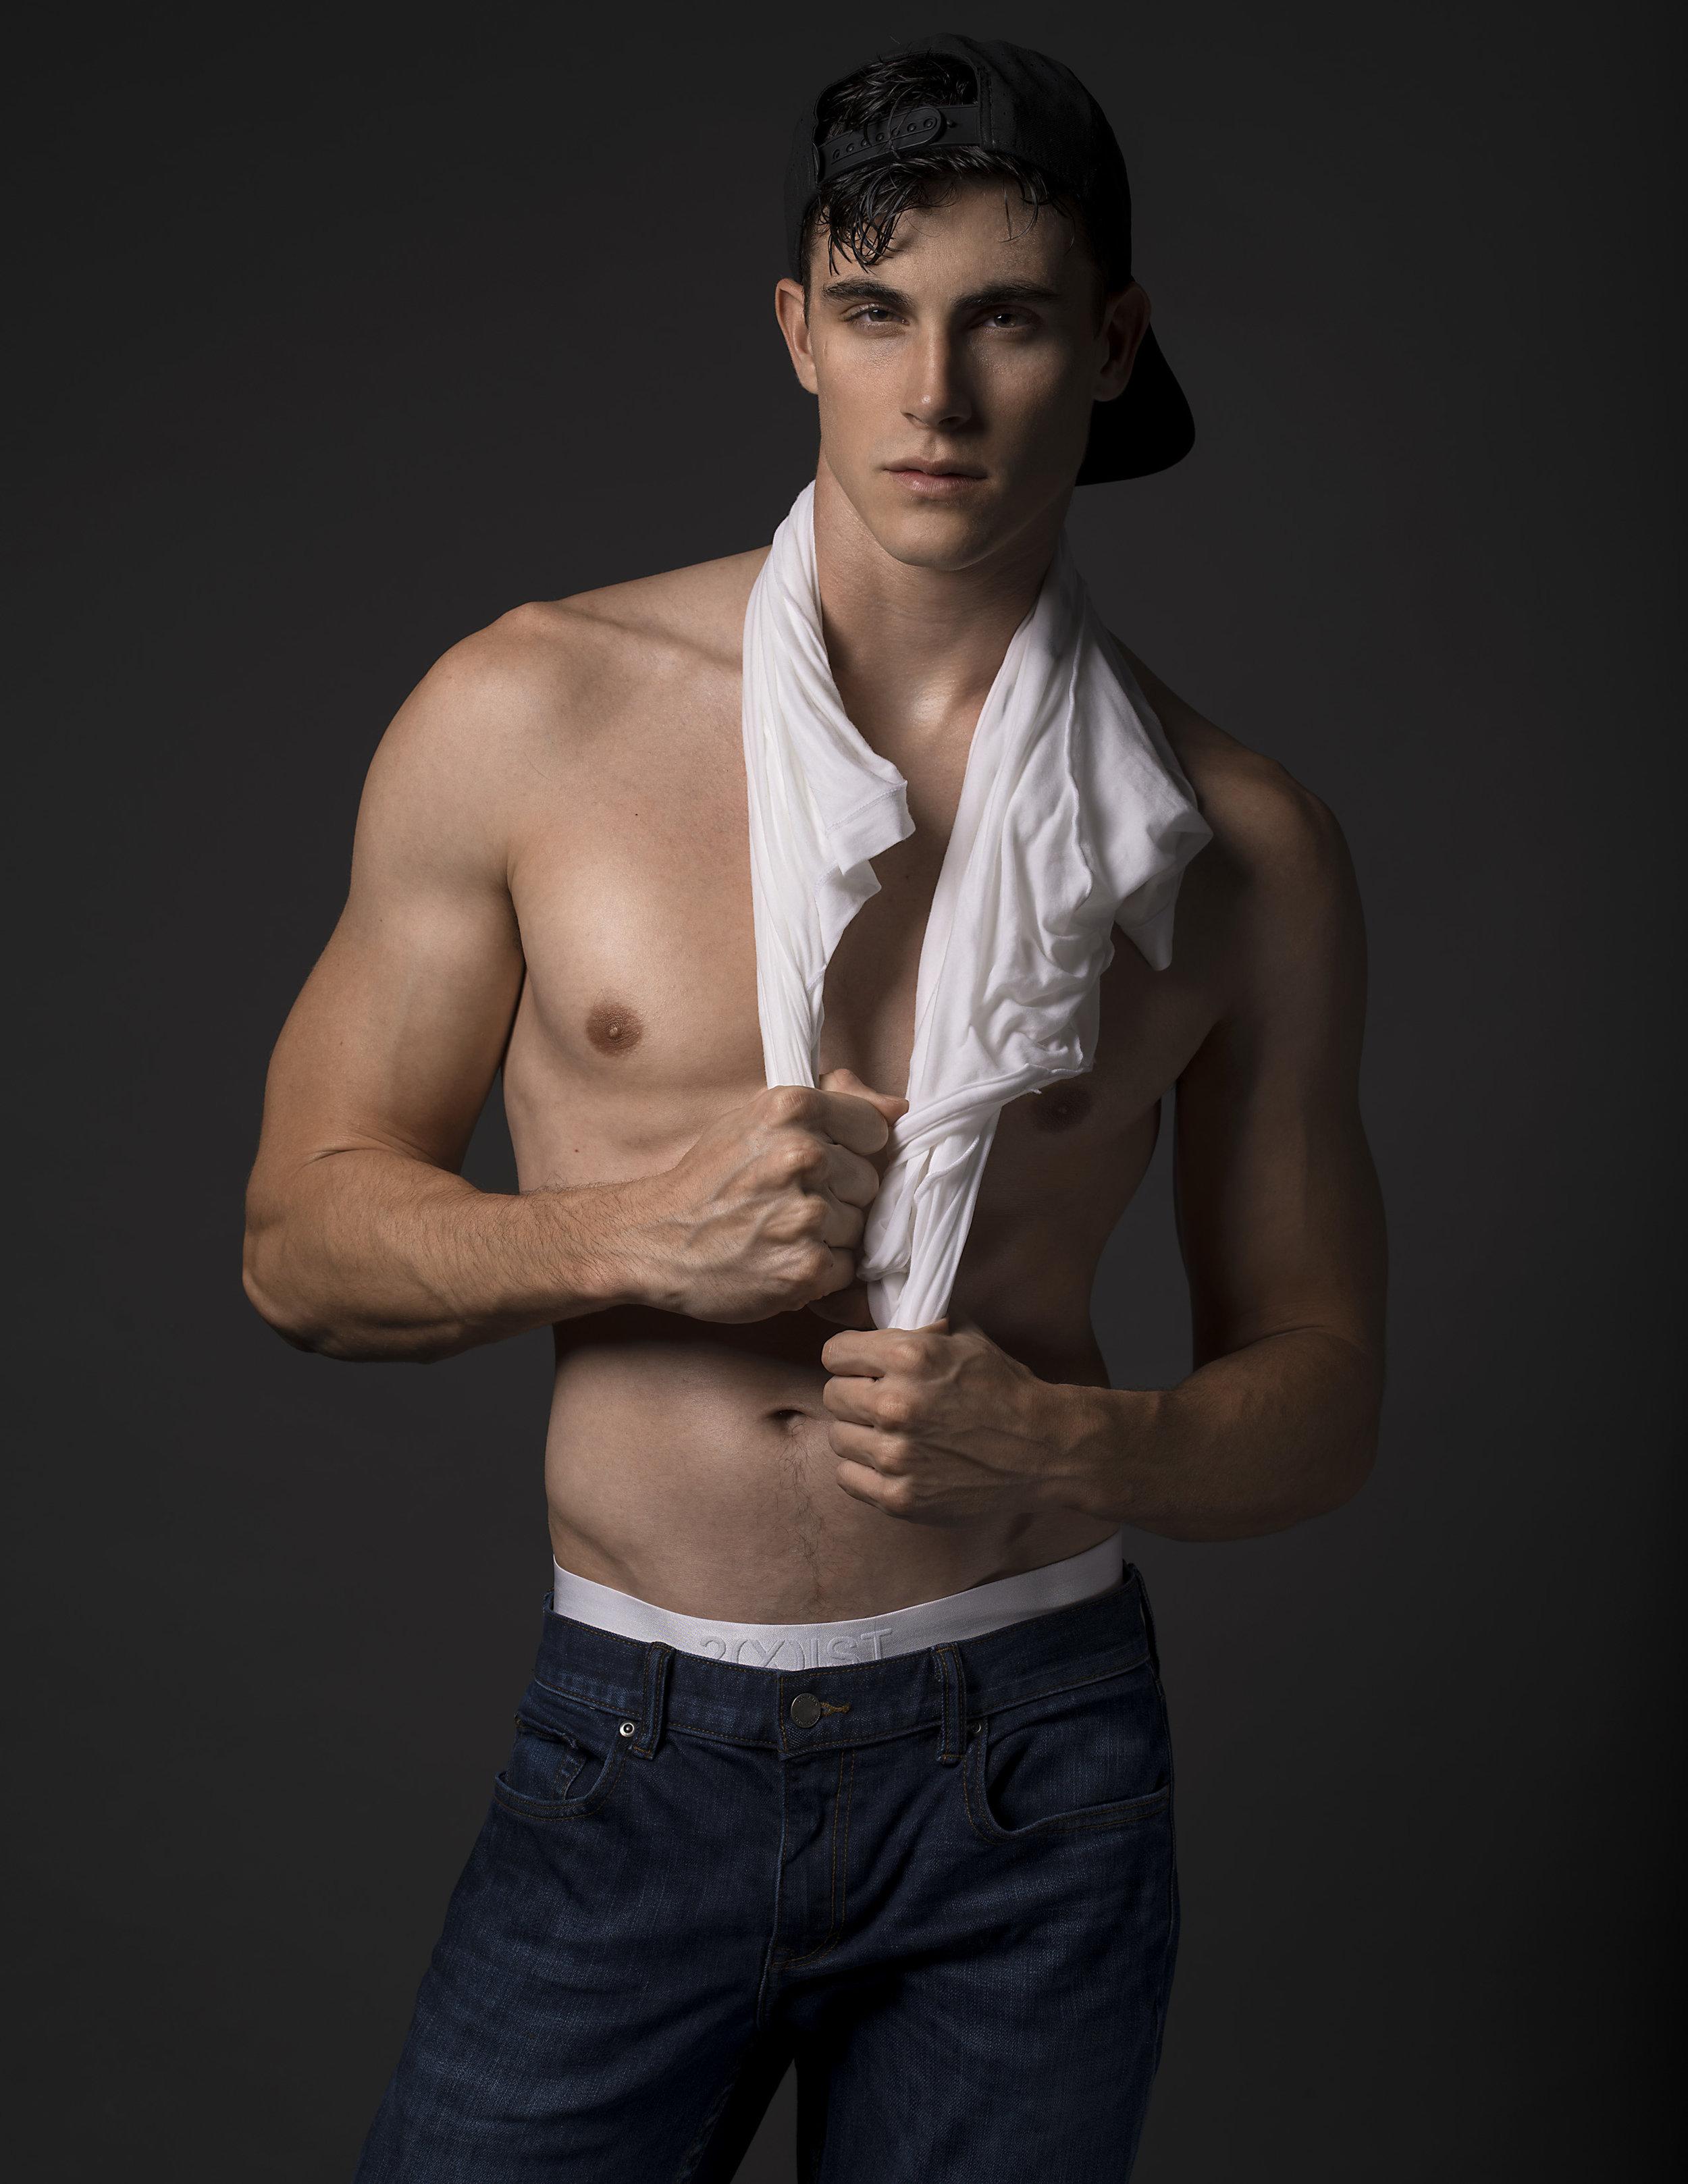 T-shirt & underwear -  2(X)ist , Denim -  Banana Republic , cap - model's own